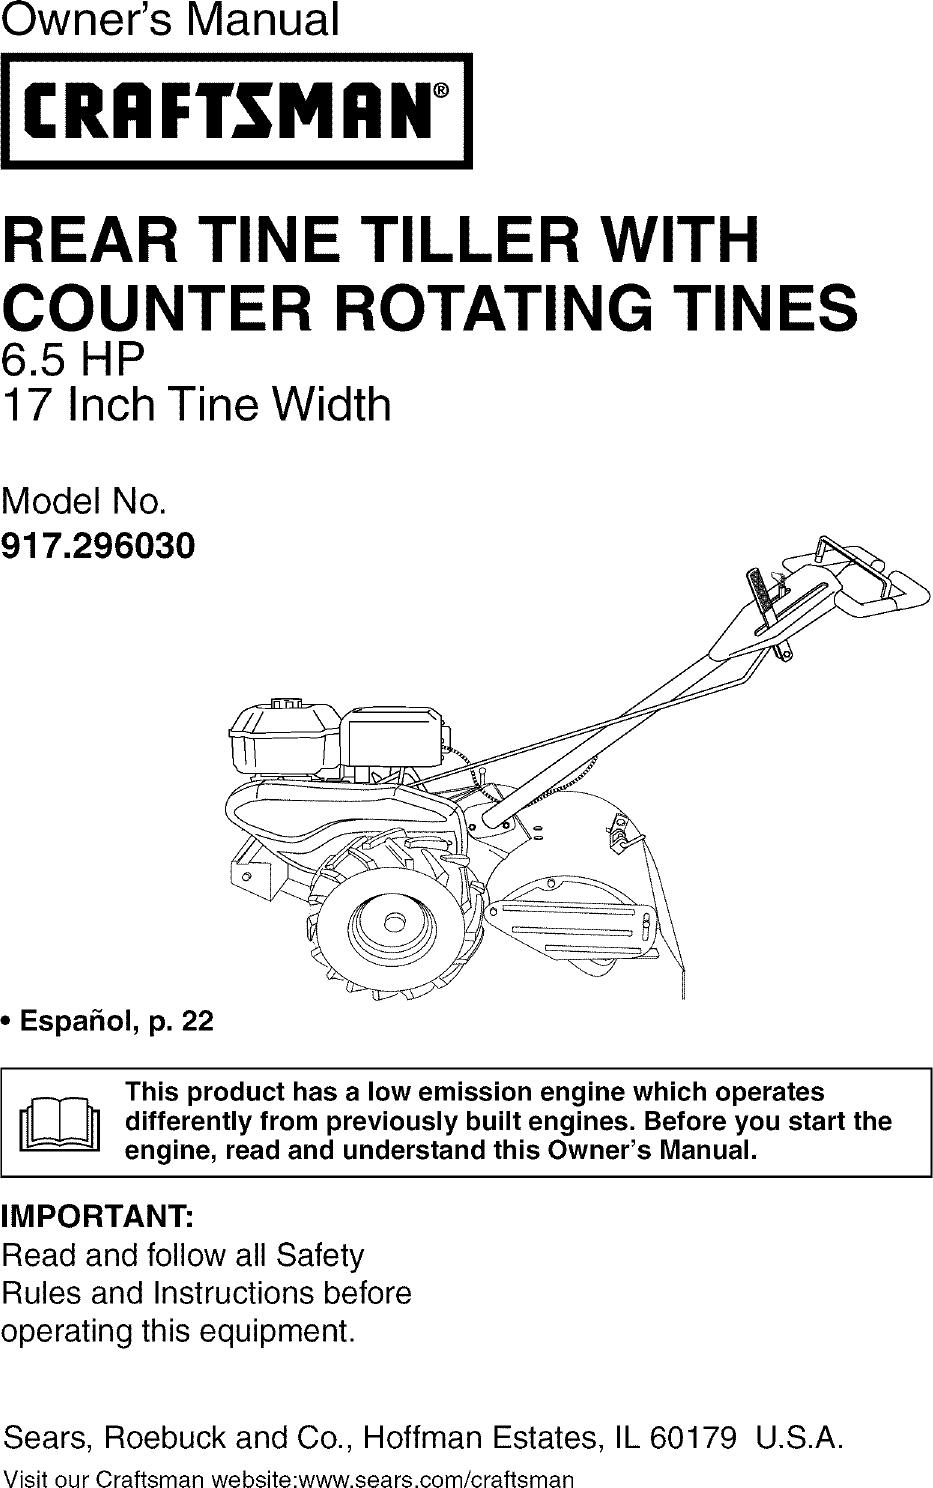 Craftsman Rear Tine Tiller Parts Diagram : craftsman, tiller, parts, diagram, Craftsman, 917296030, Manual, TILLER, Manuals, Guides, L0601149